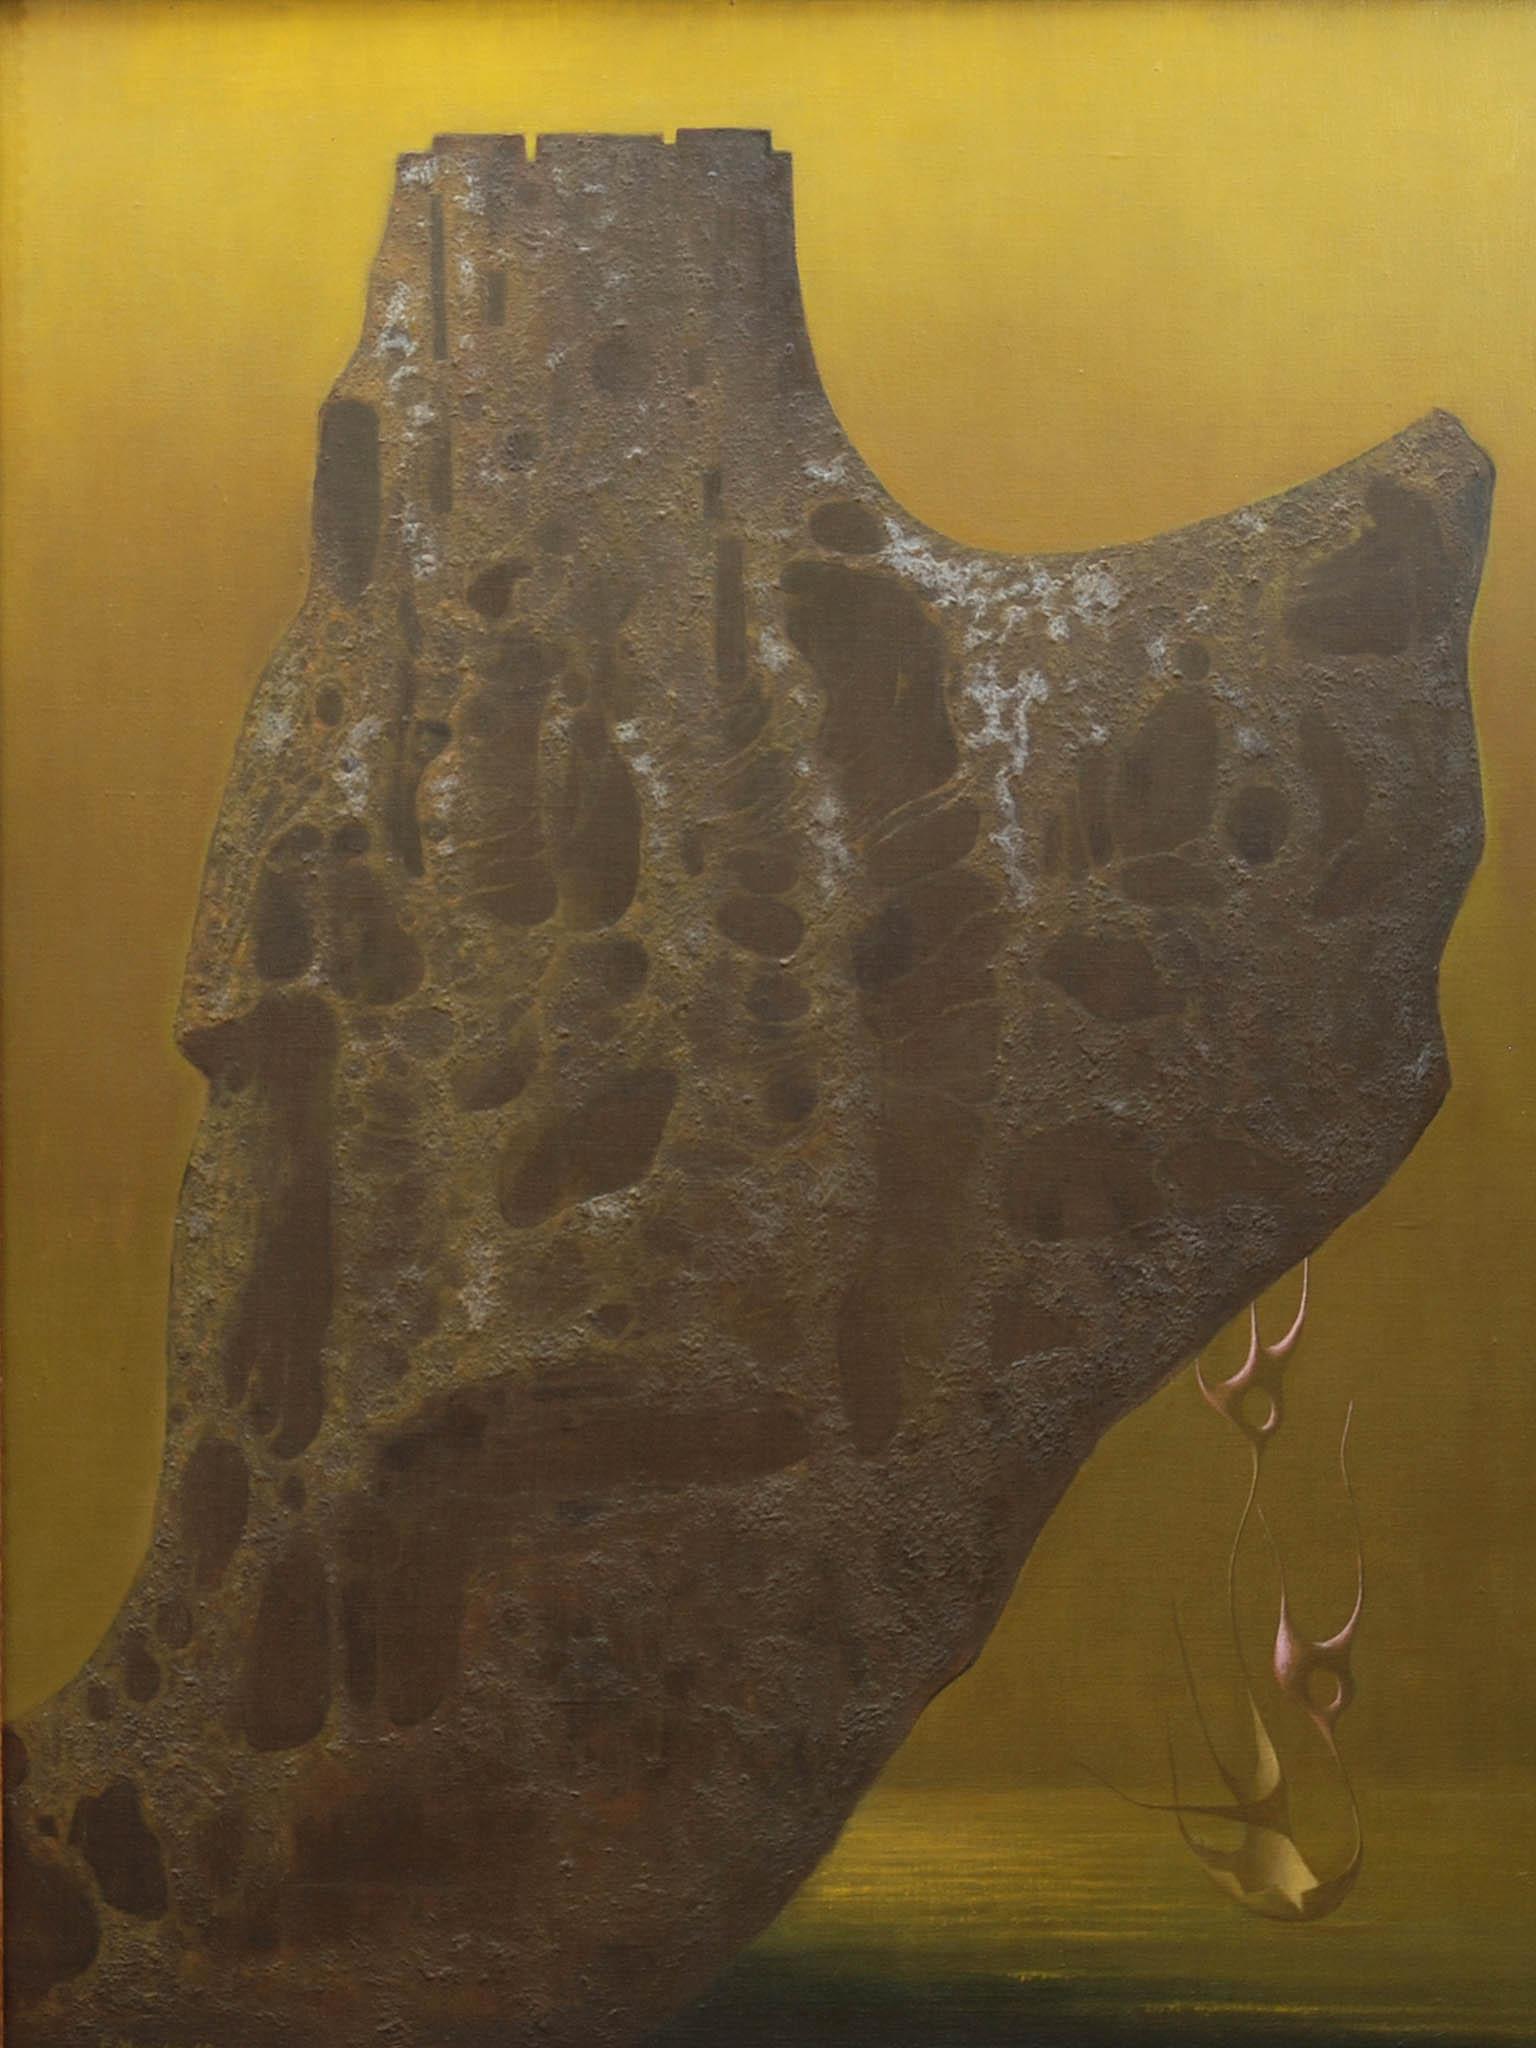 František Muzika: Citadela IX (Útes IV), 1962–1968